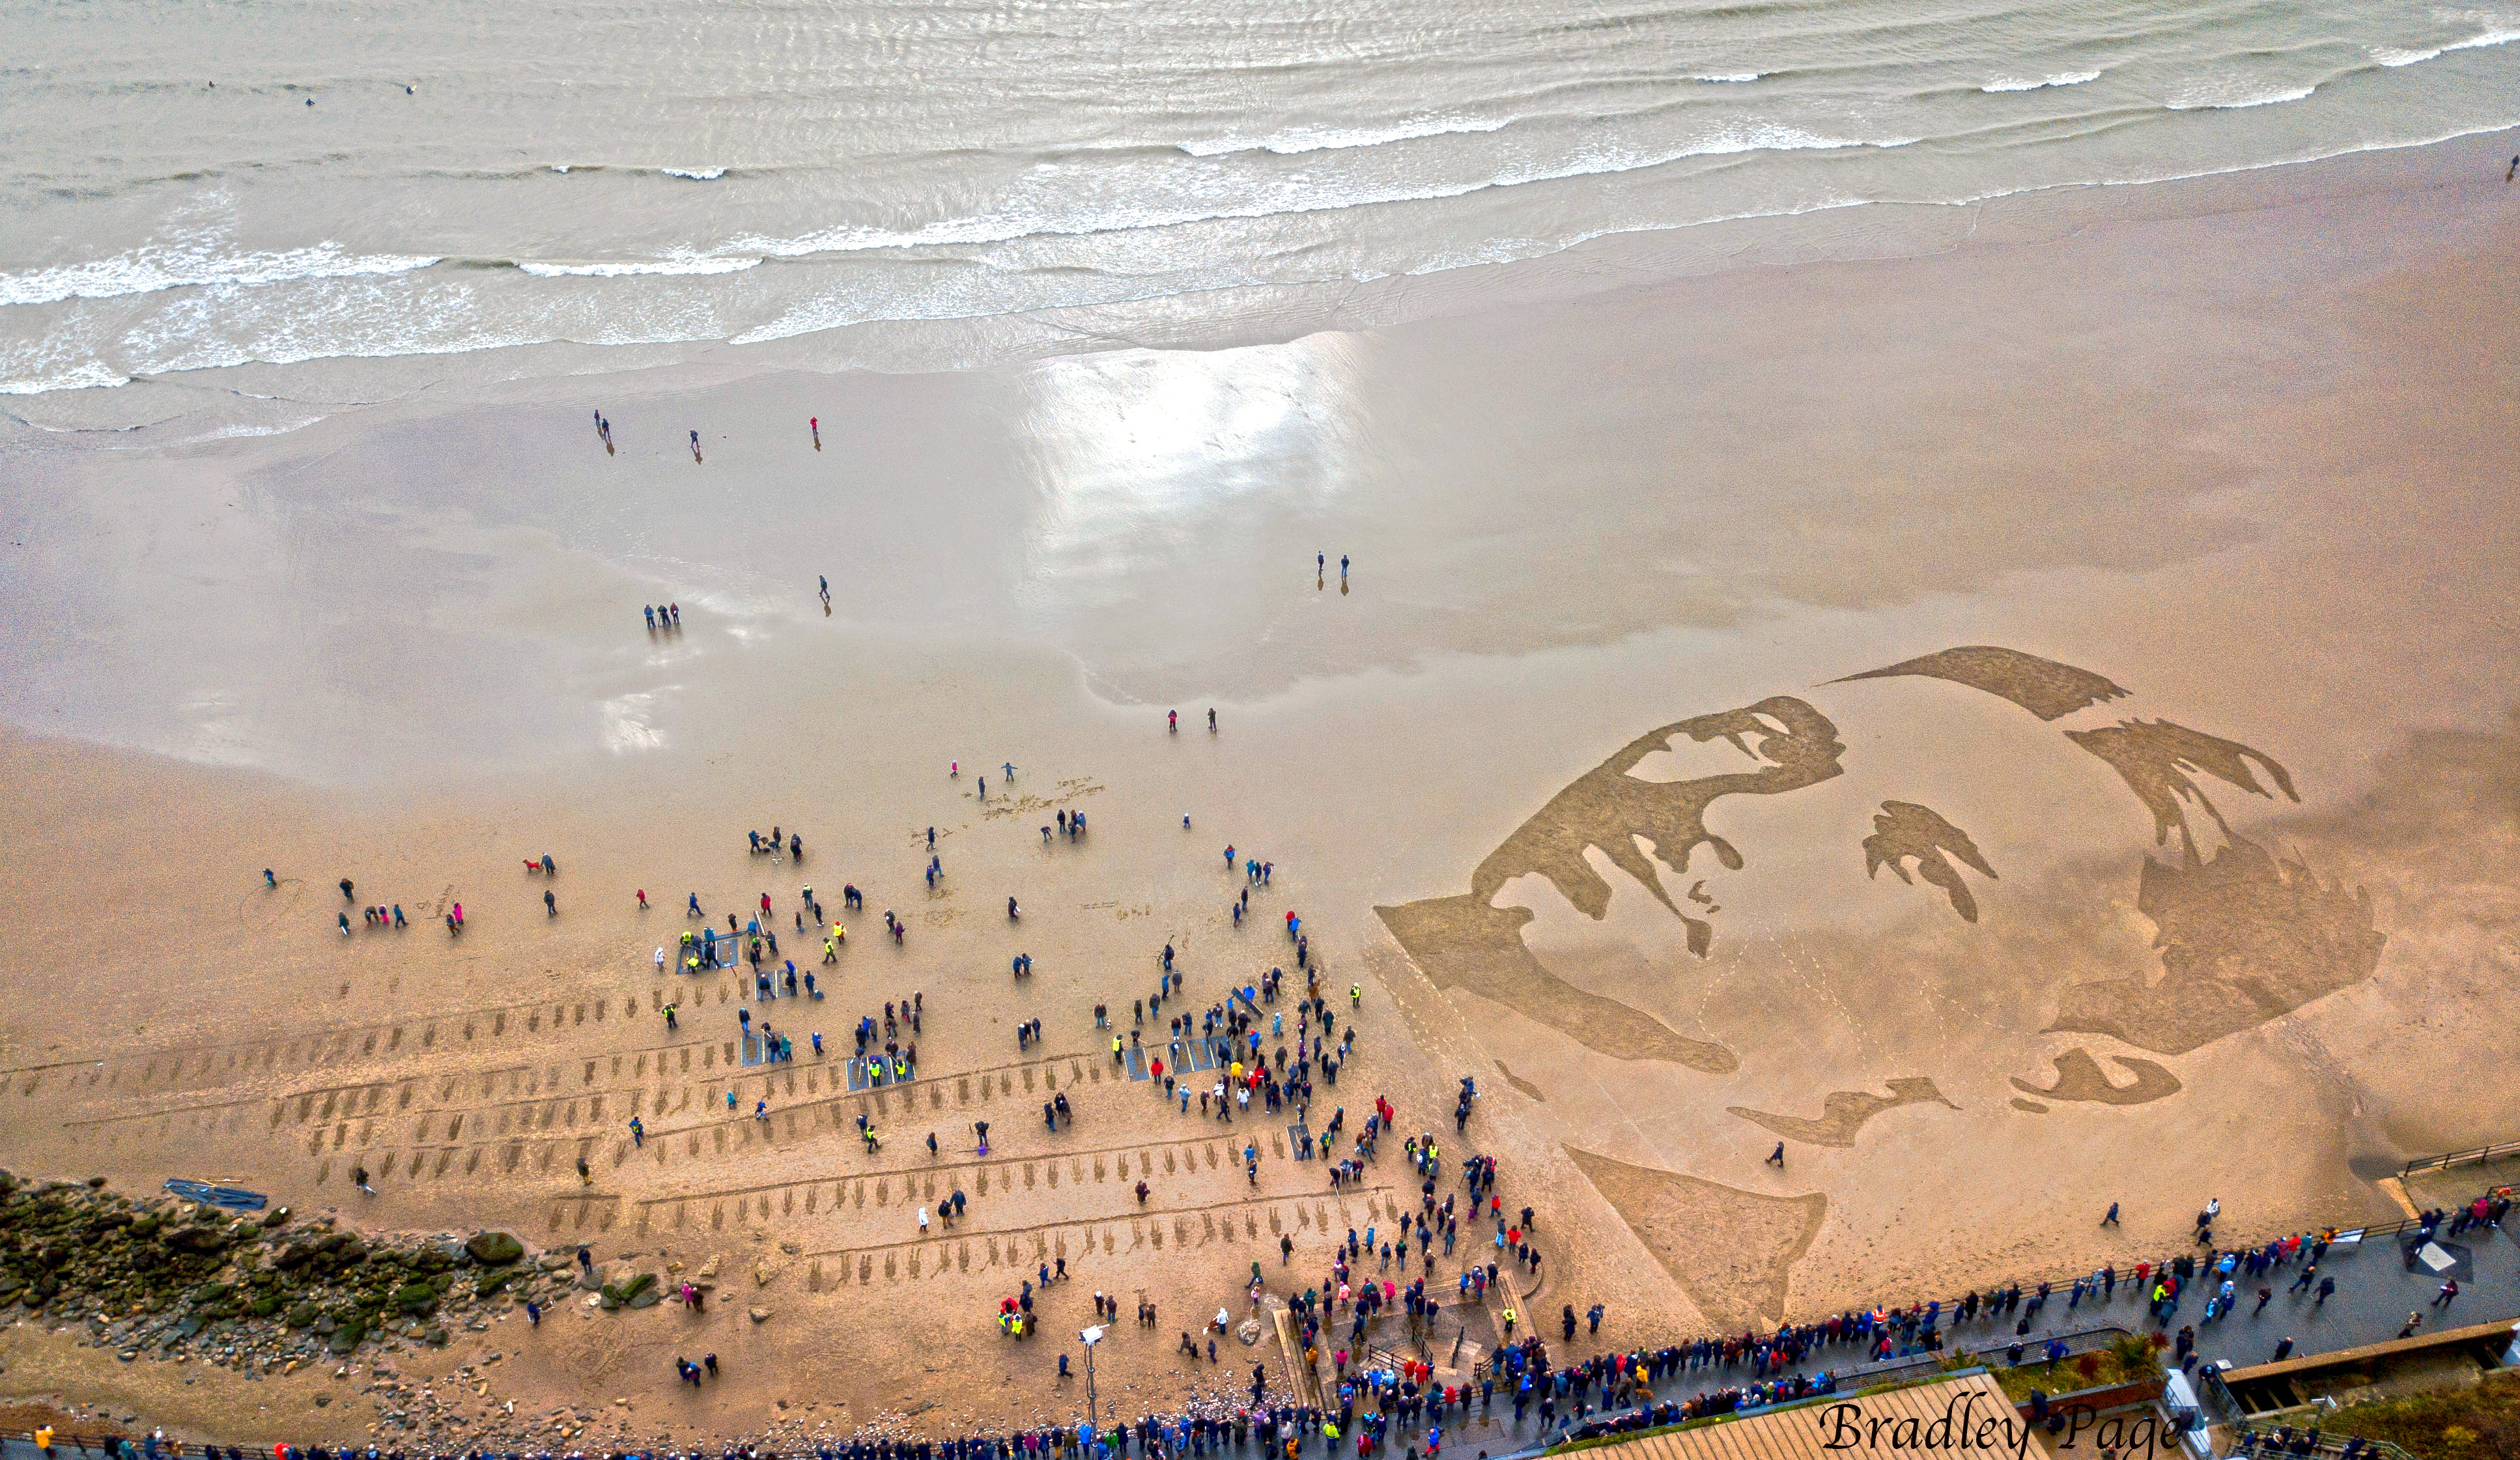 Folkestone Beach drawing